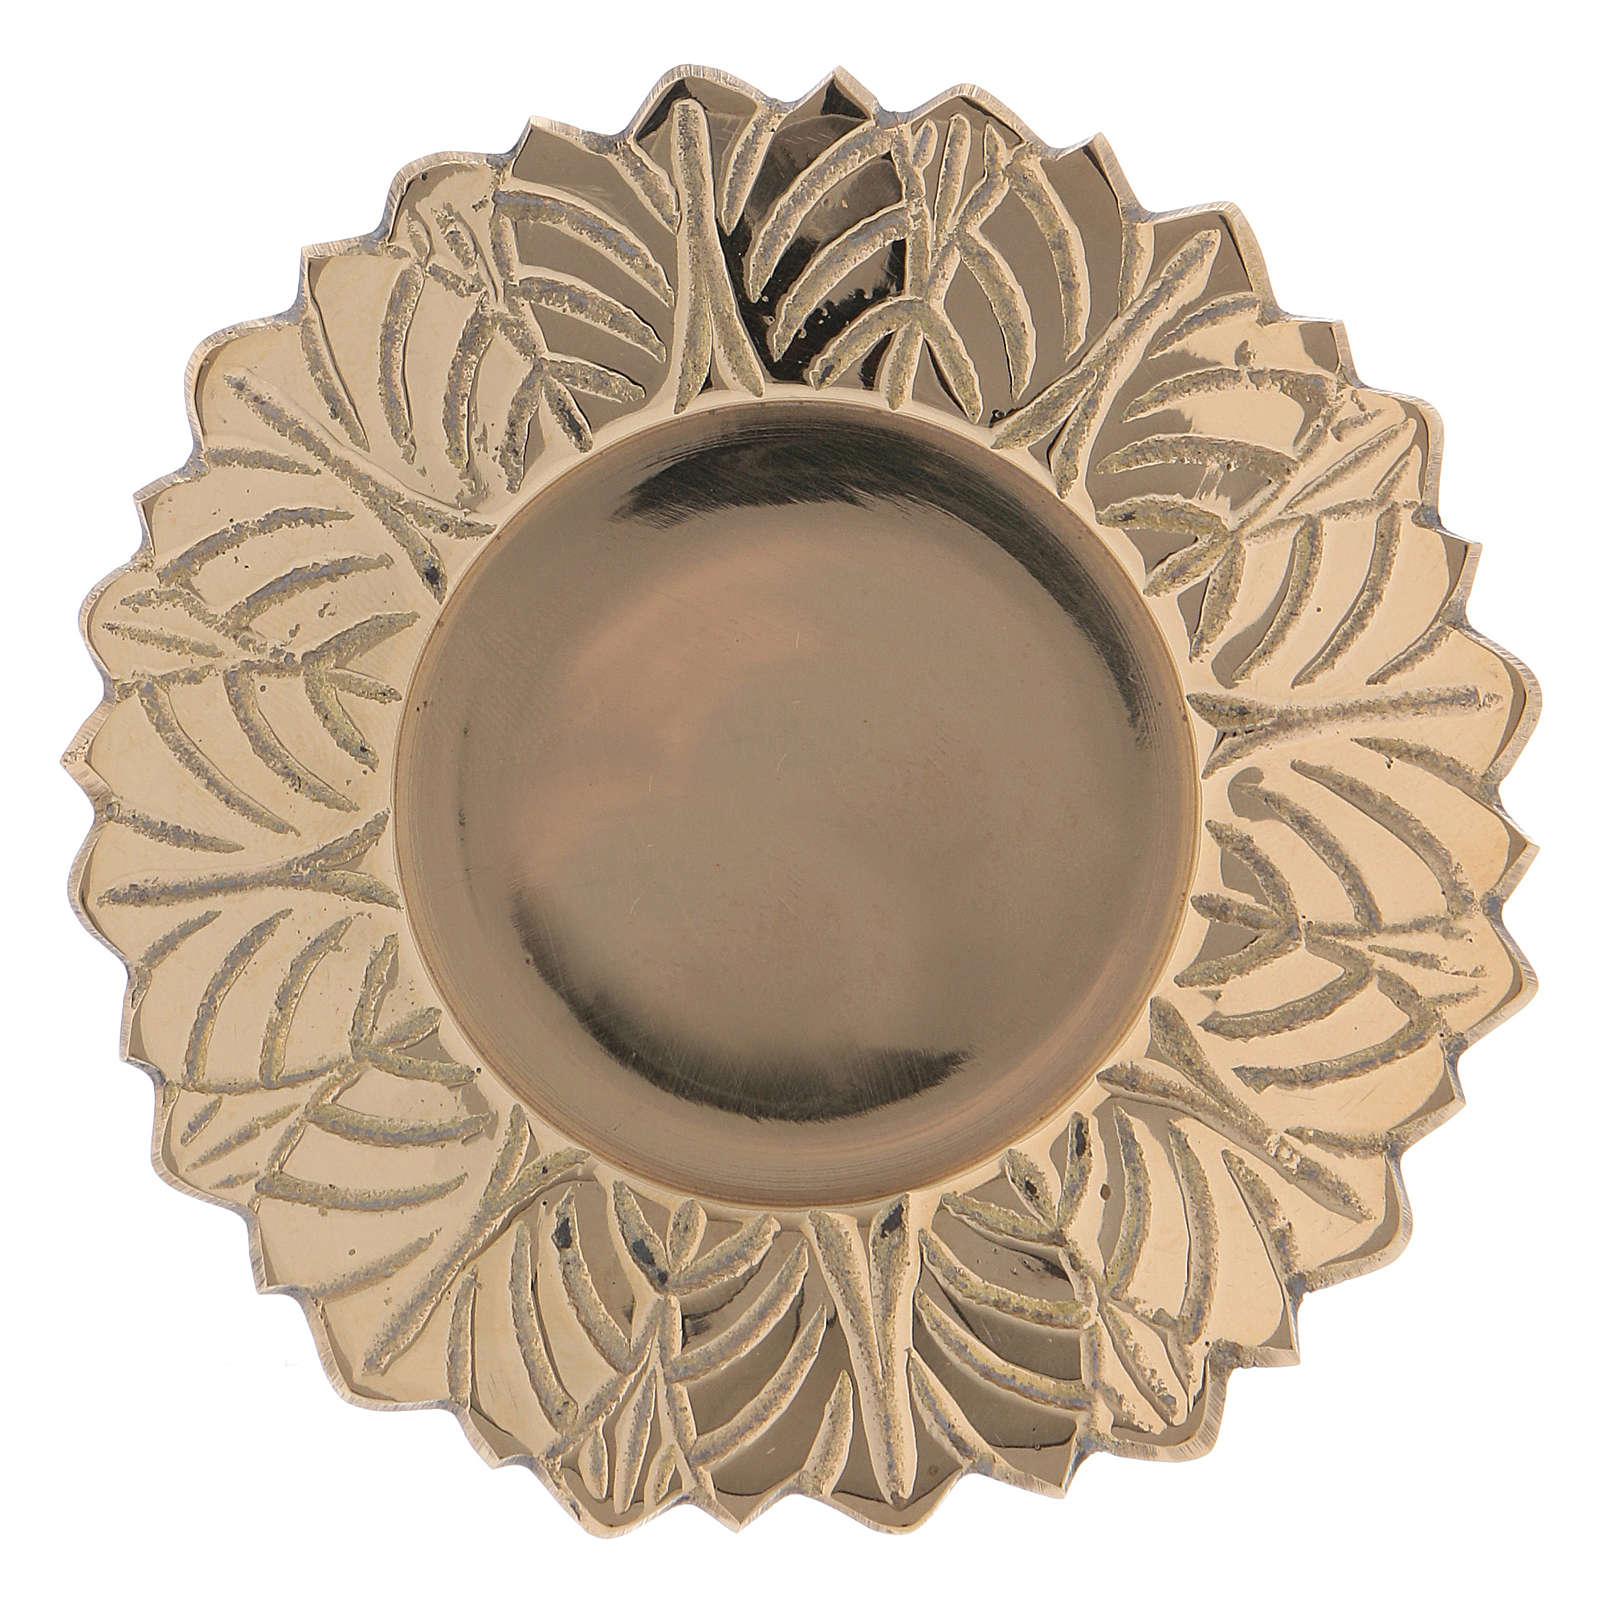 Piattino portacandela bordo foglie ottone dorato 4 cm 3